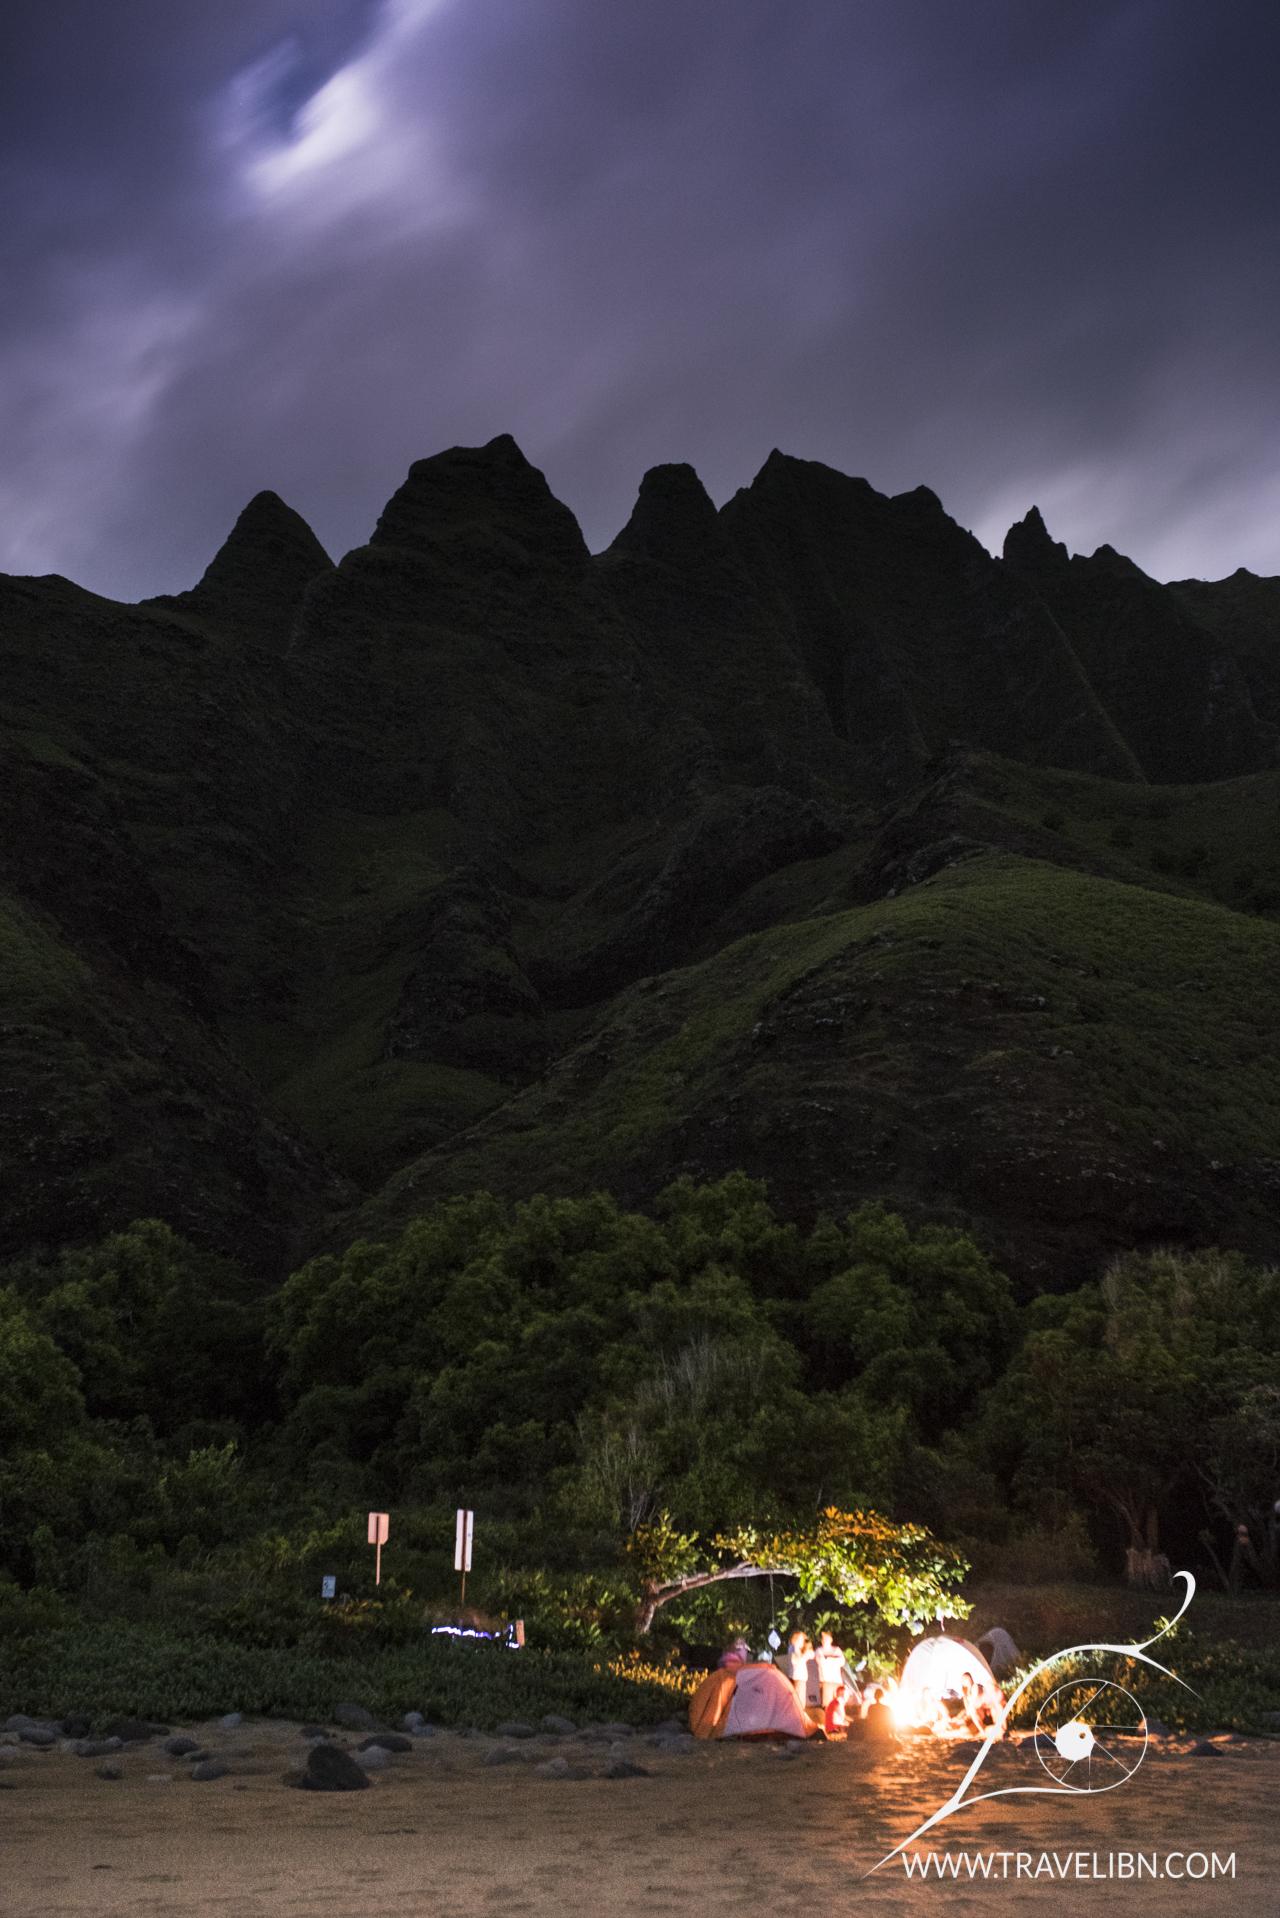 Night Kalalau Campground